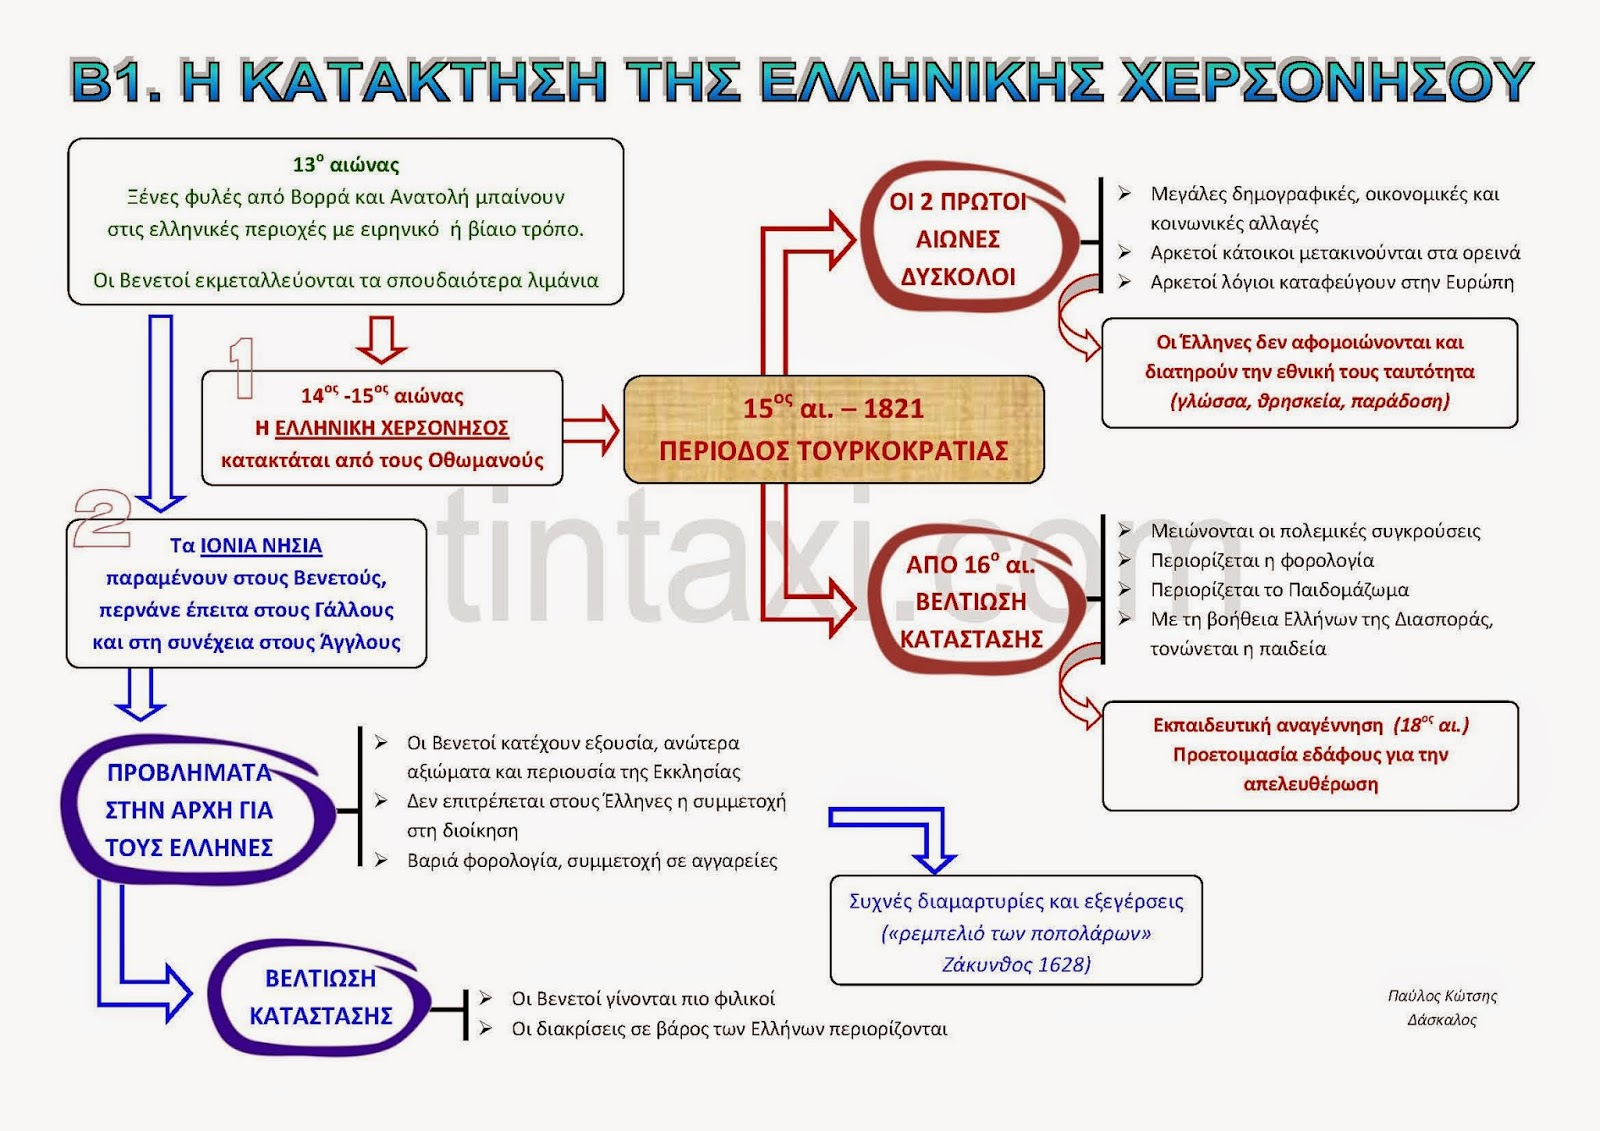 http://www.stintaxi.com/uploads/1/3/1/0/13100858/b1-kataktisi-v2.1.pdf